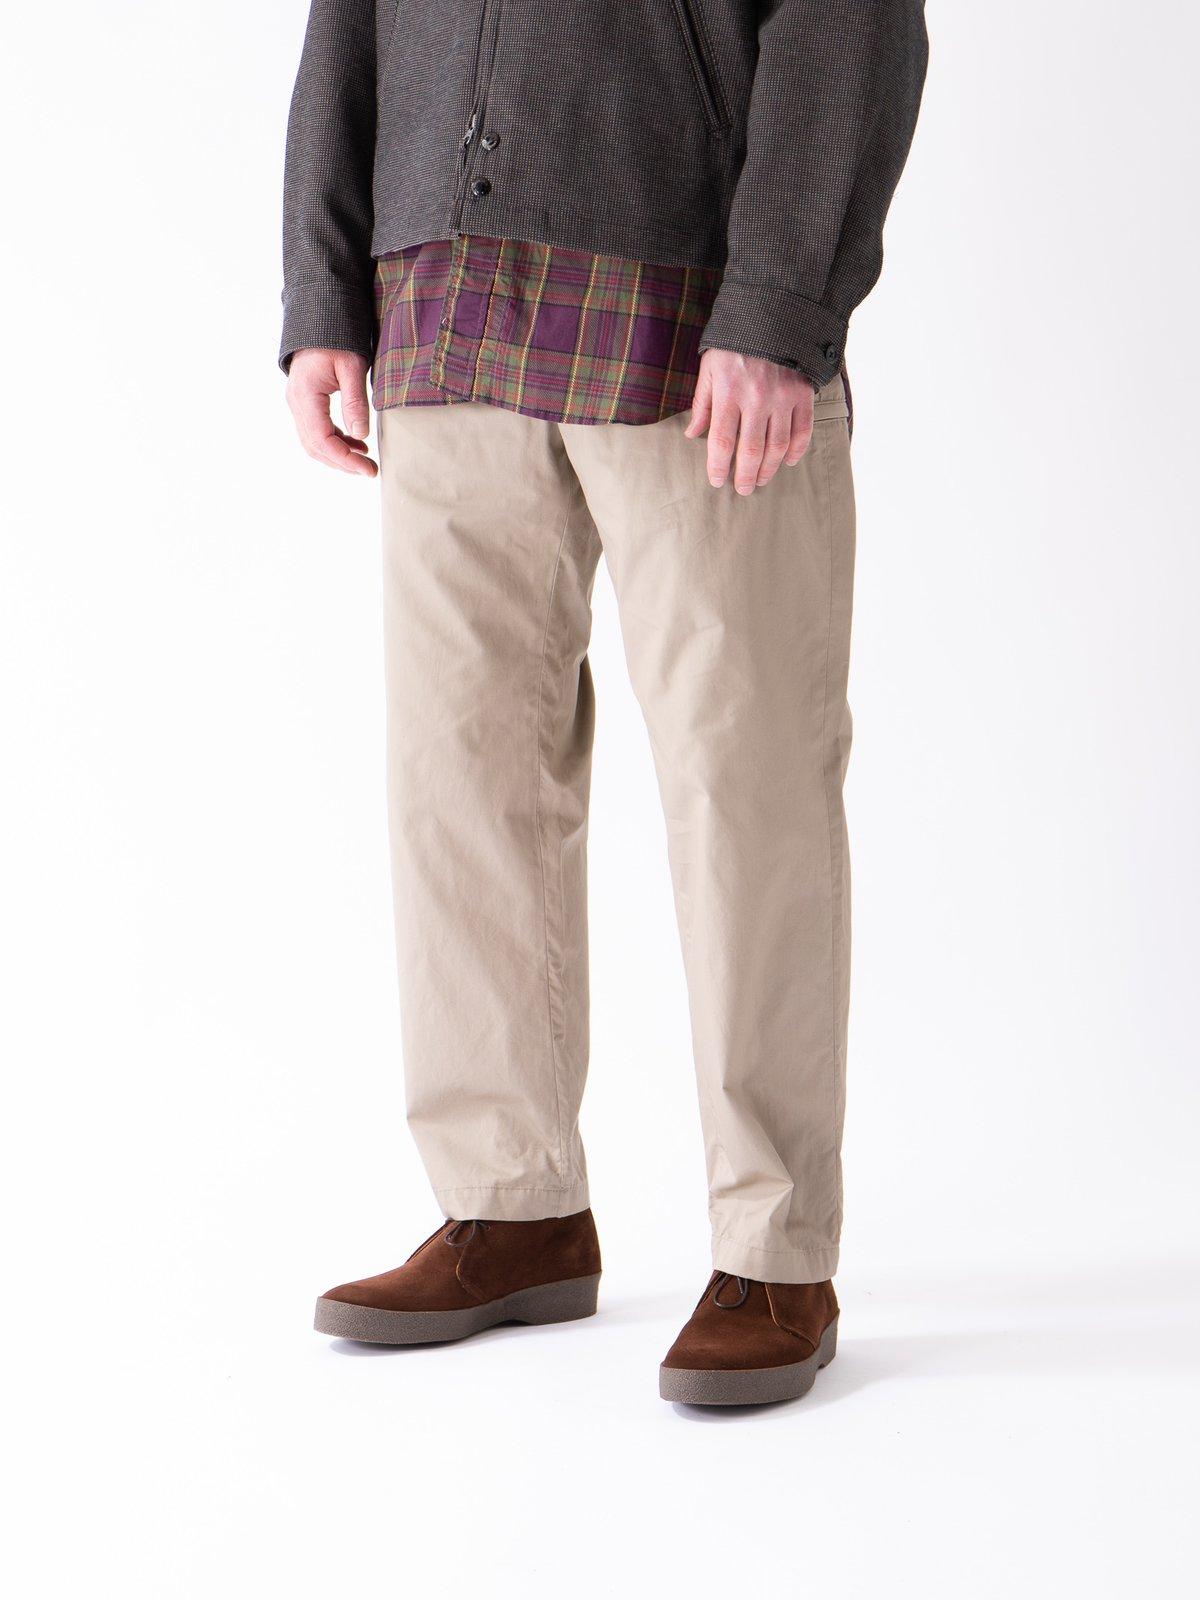 Khaki Highcount Twill Drawstring Pant - Image 2